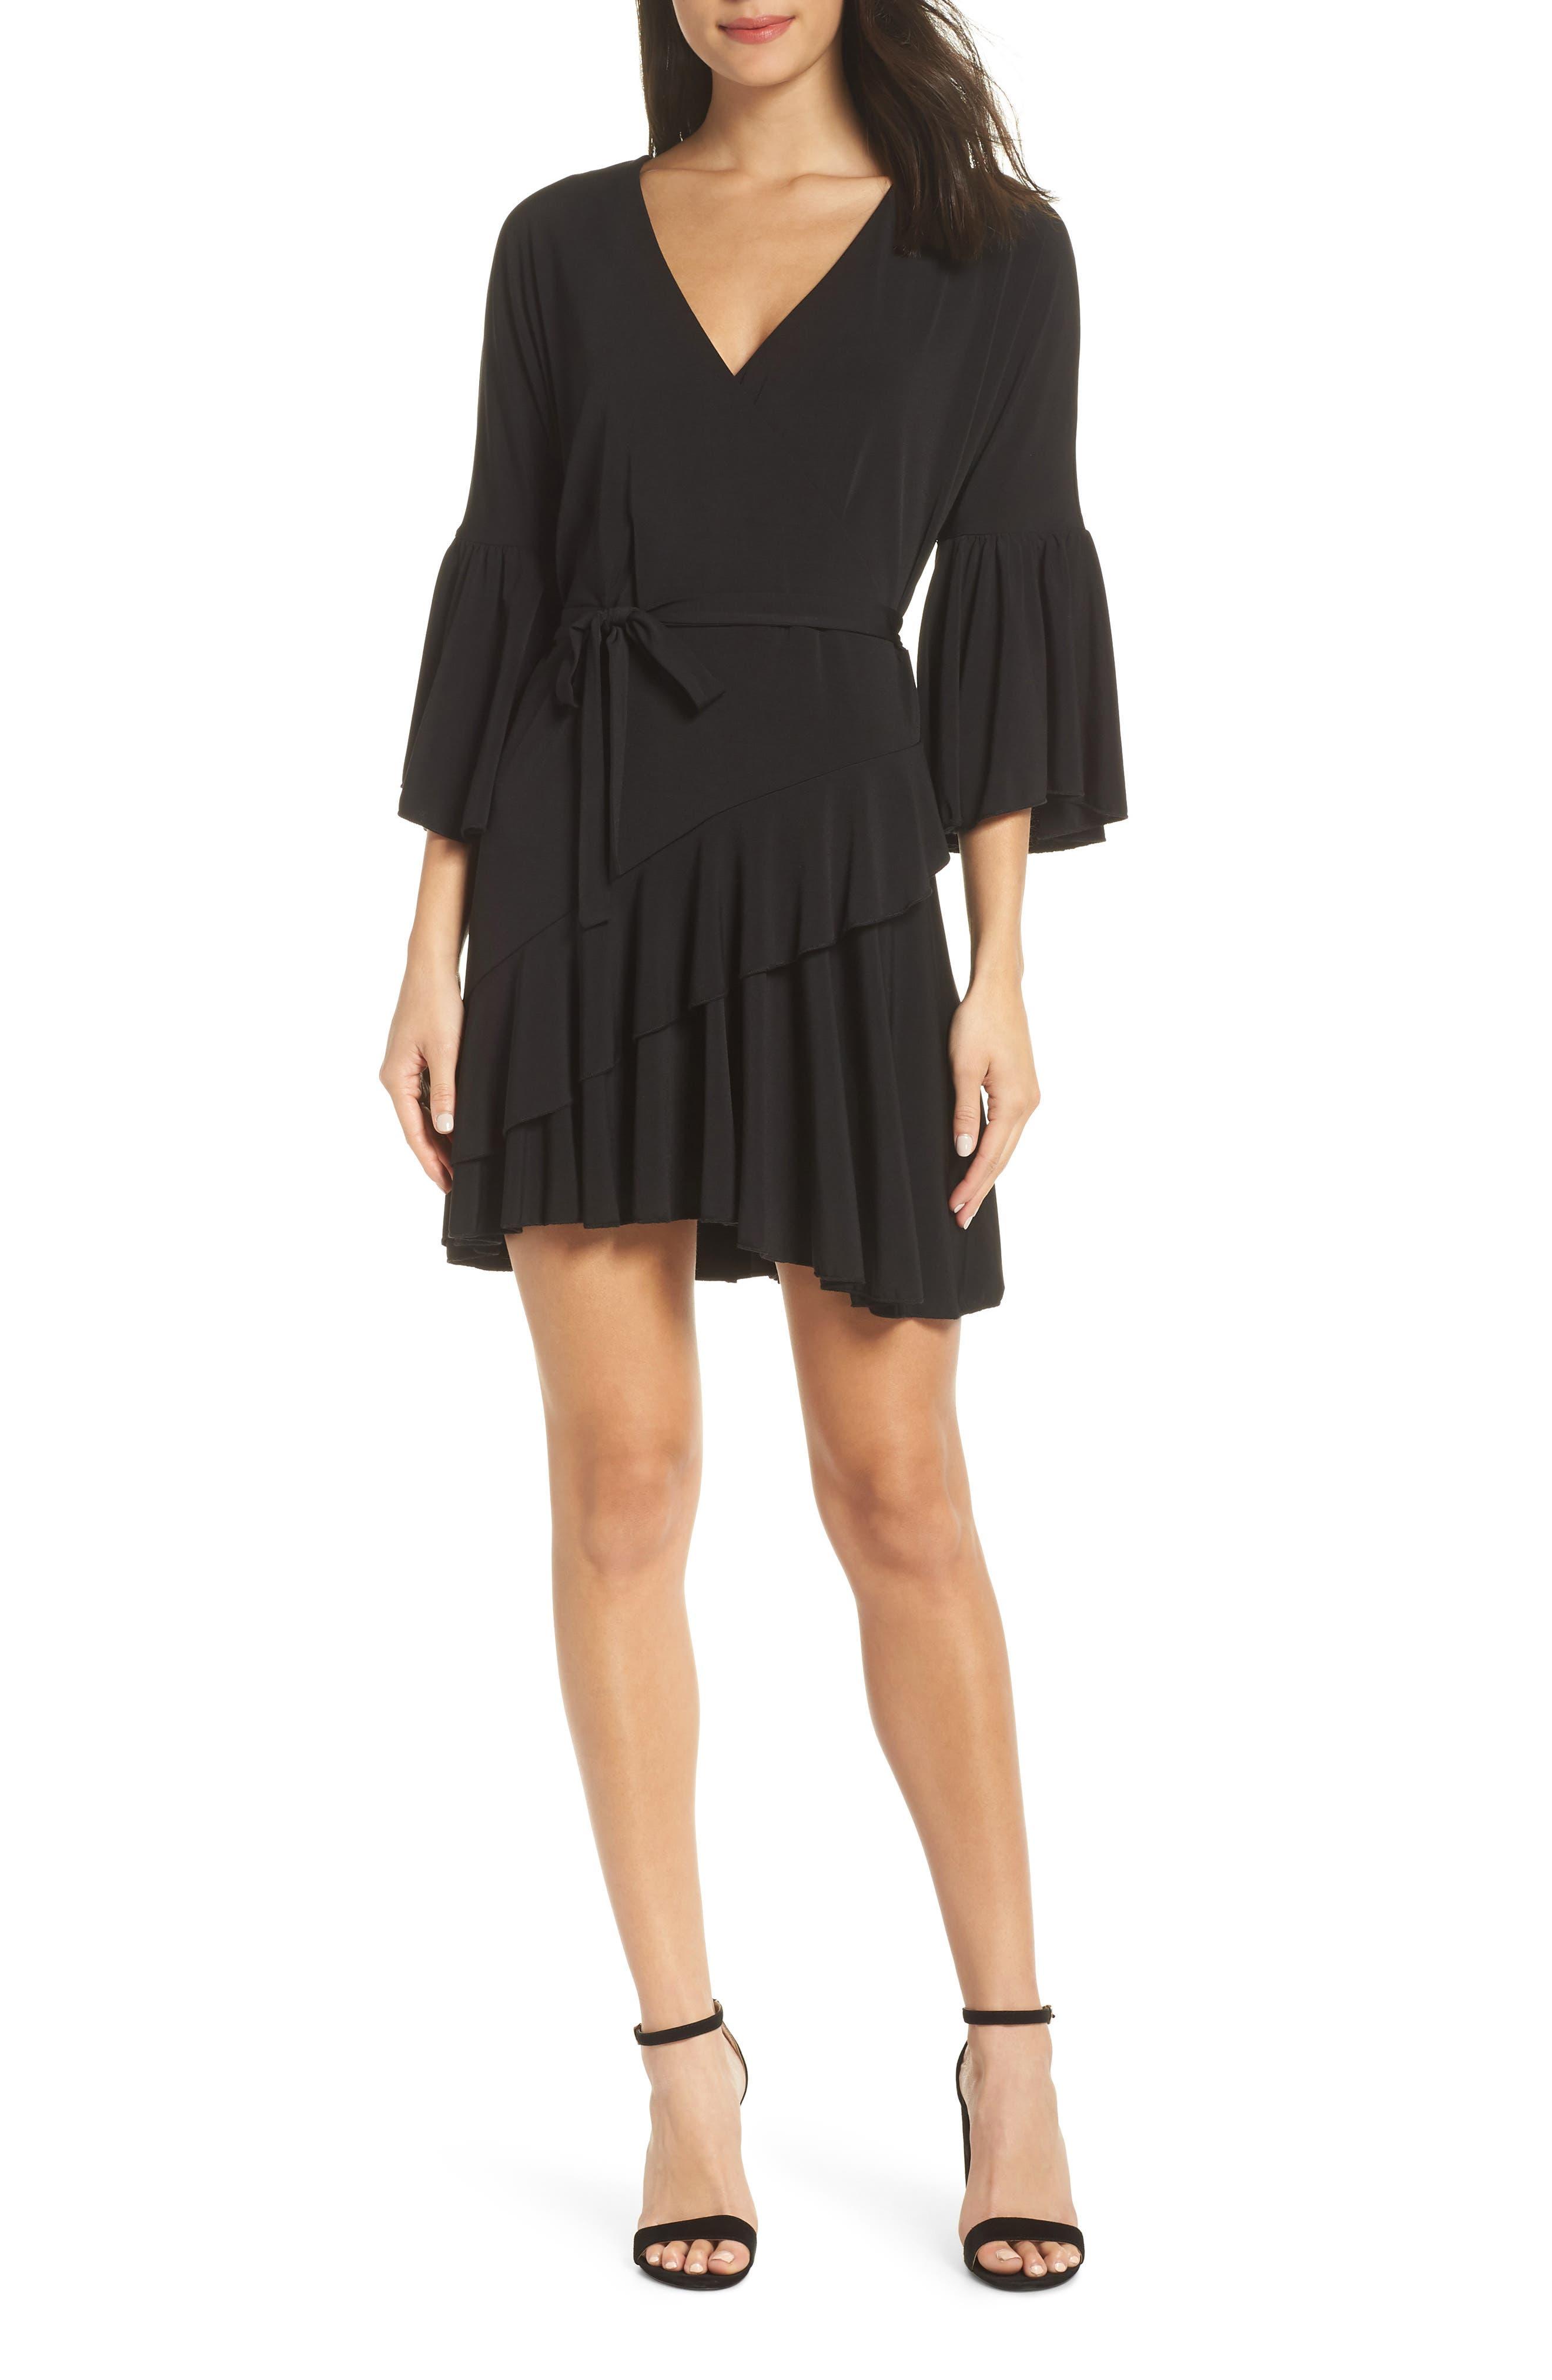 French Connection Ellette Dress, Black